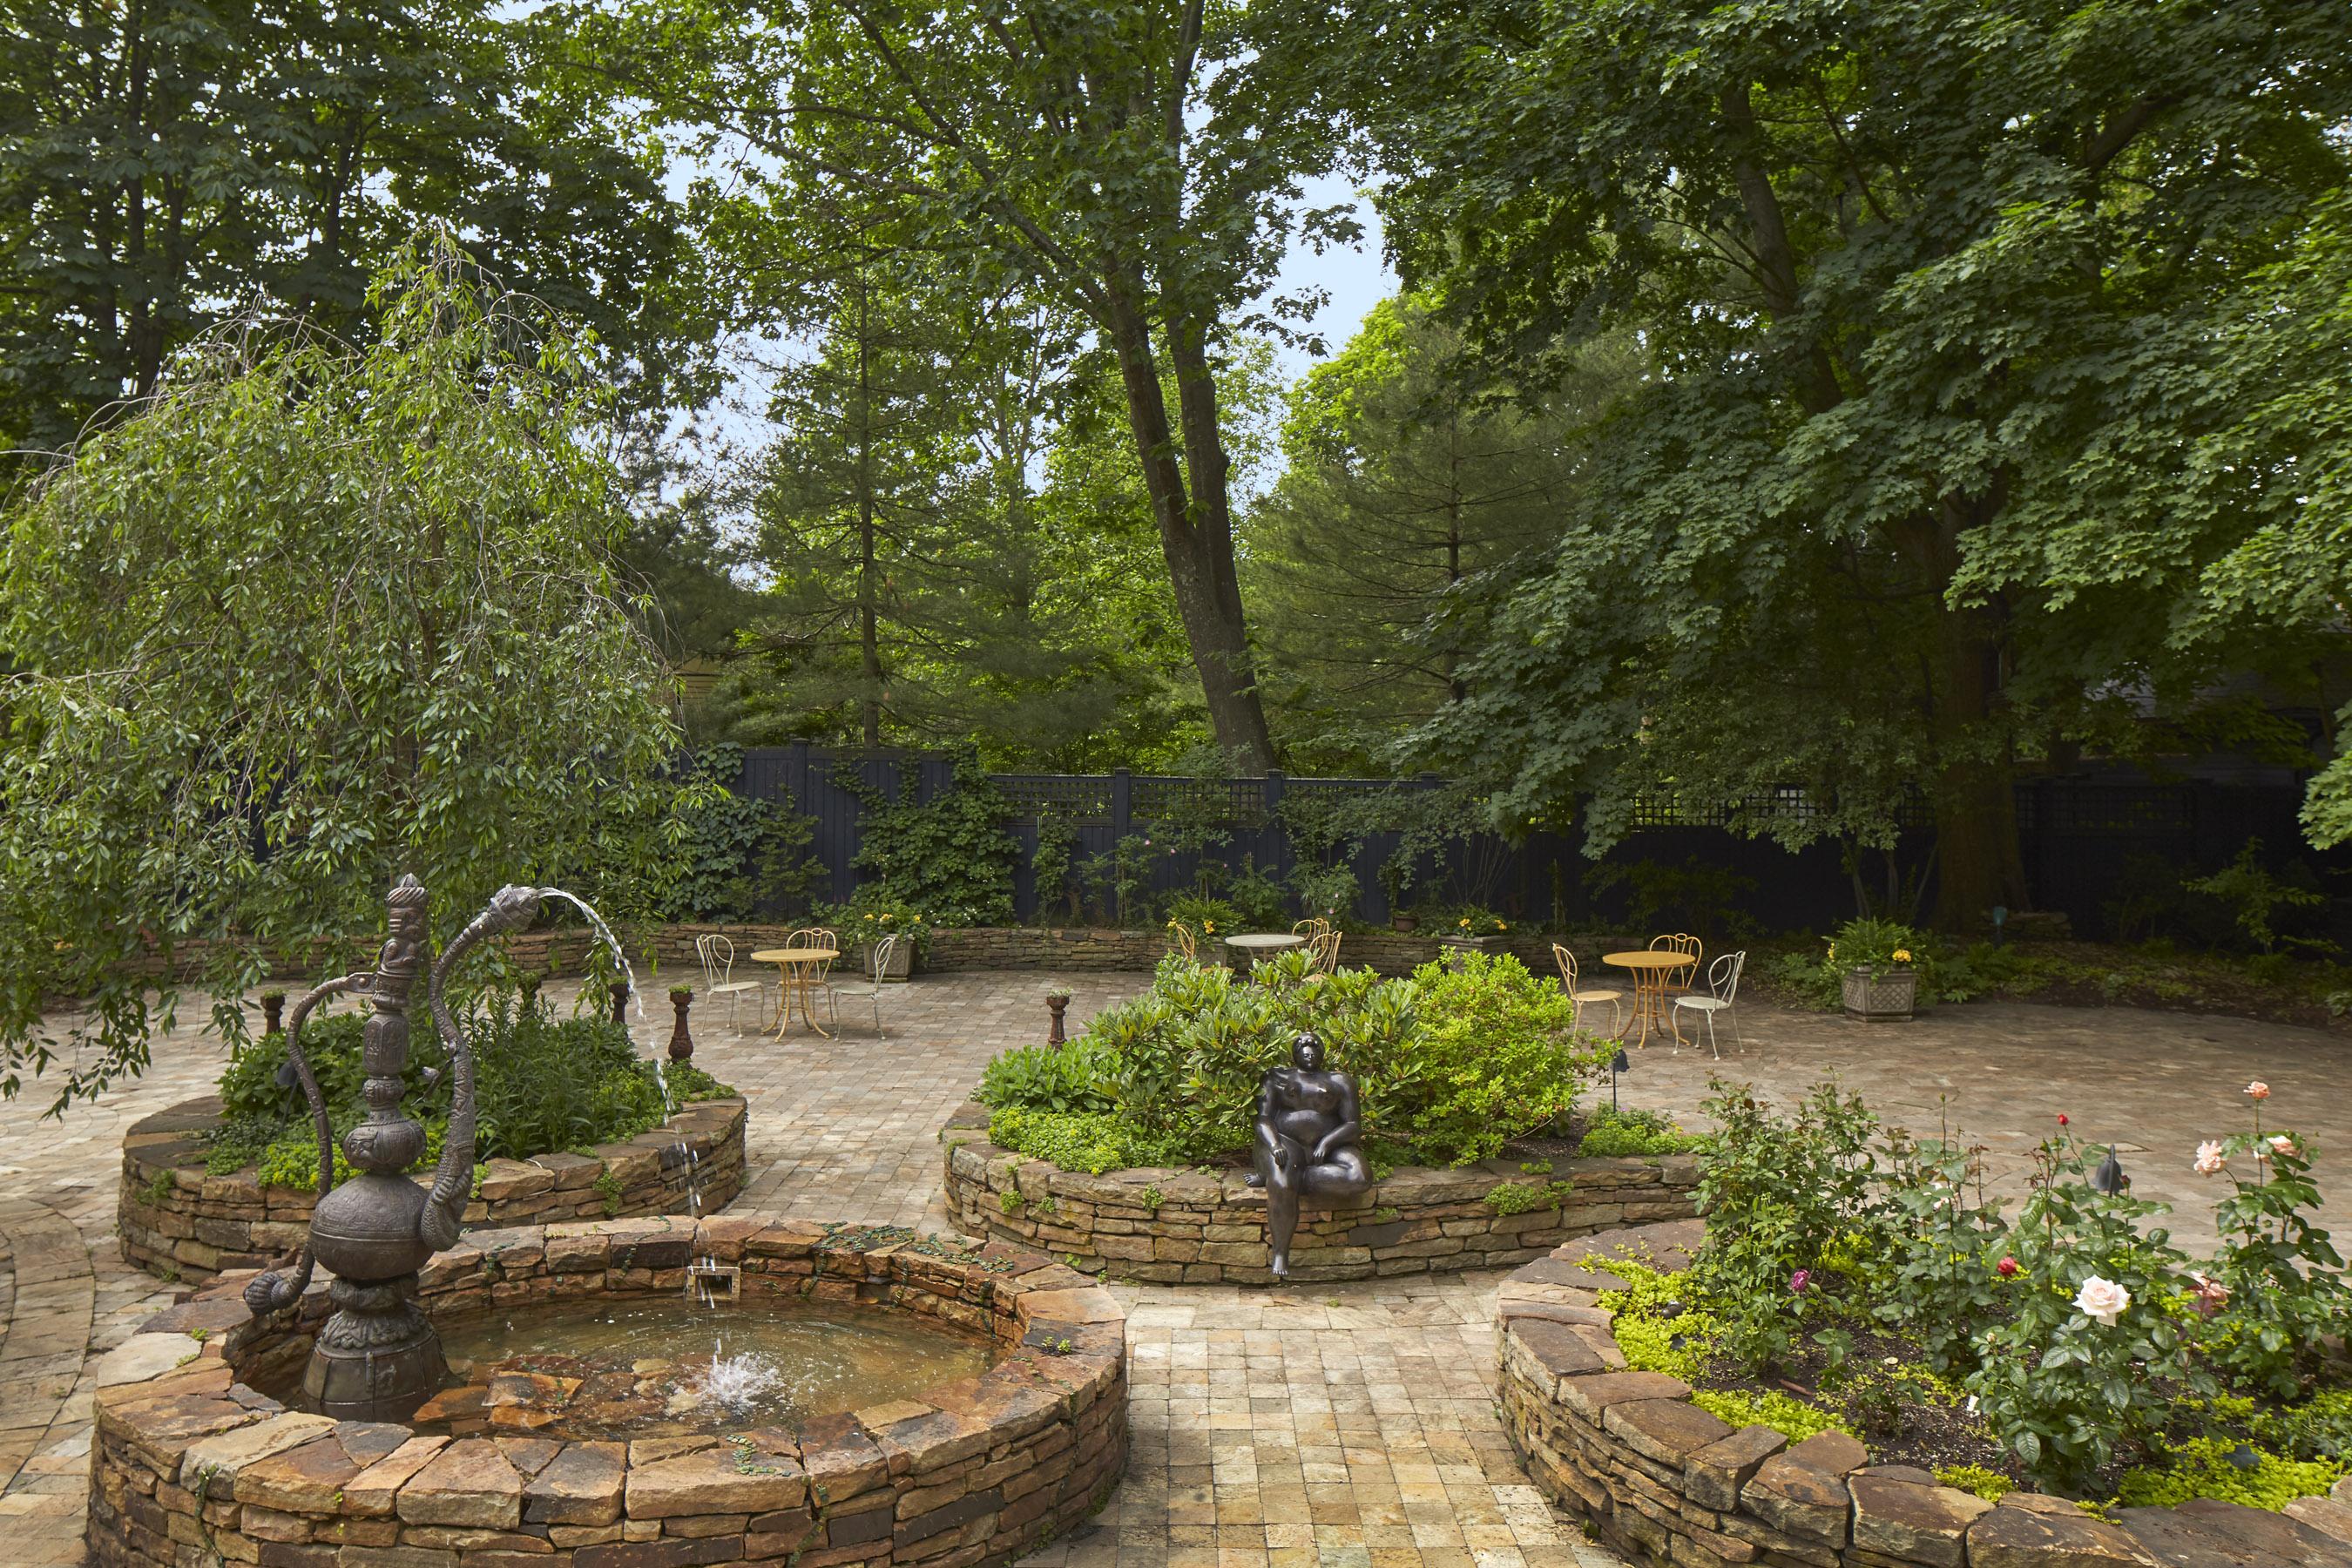 168_brattle_st_courtyard1